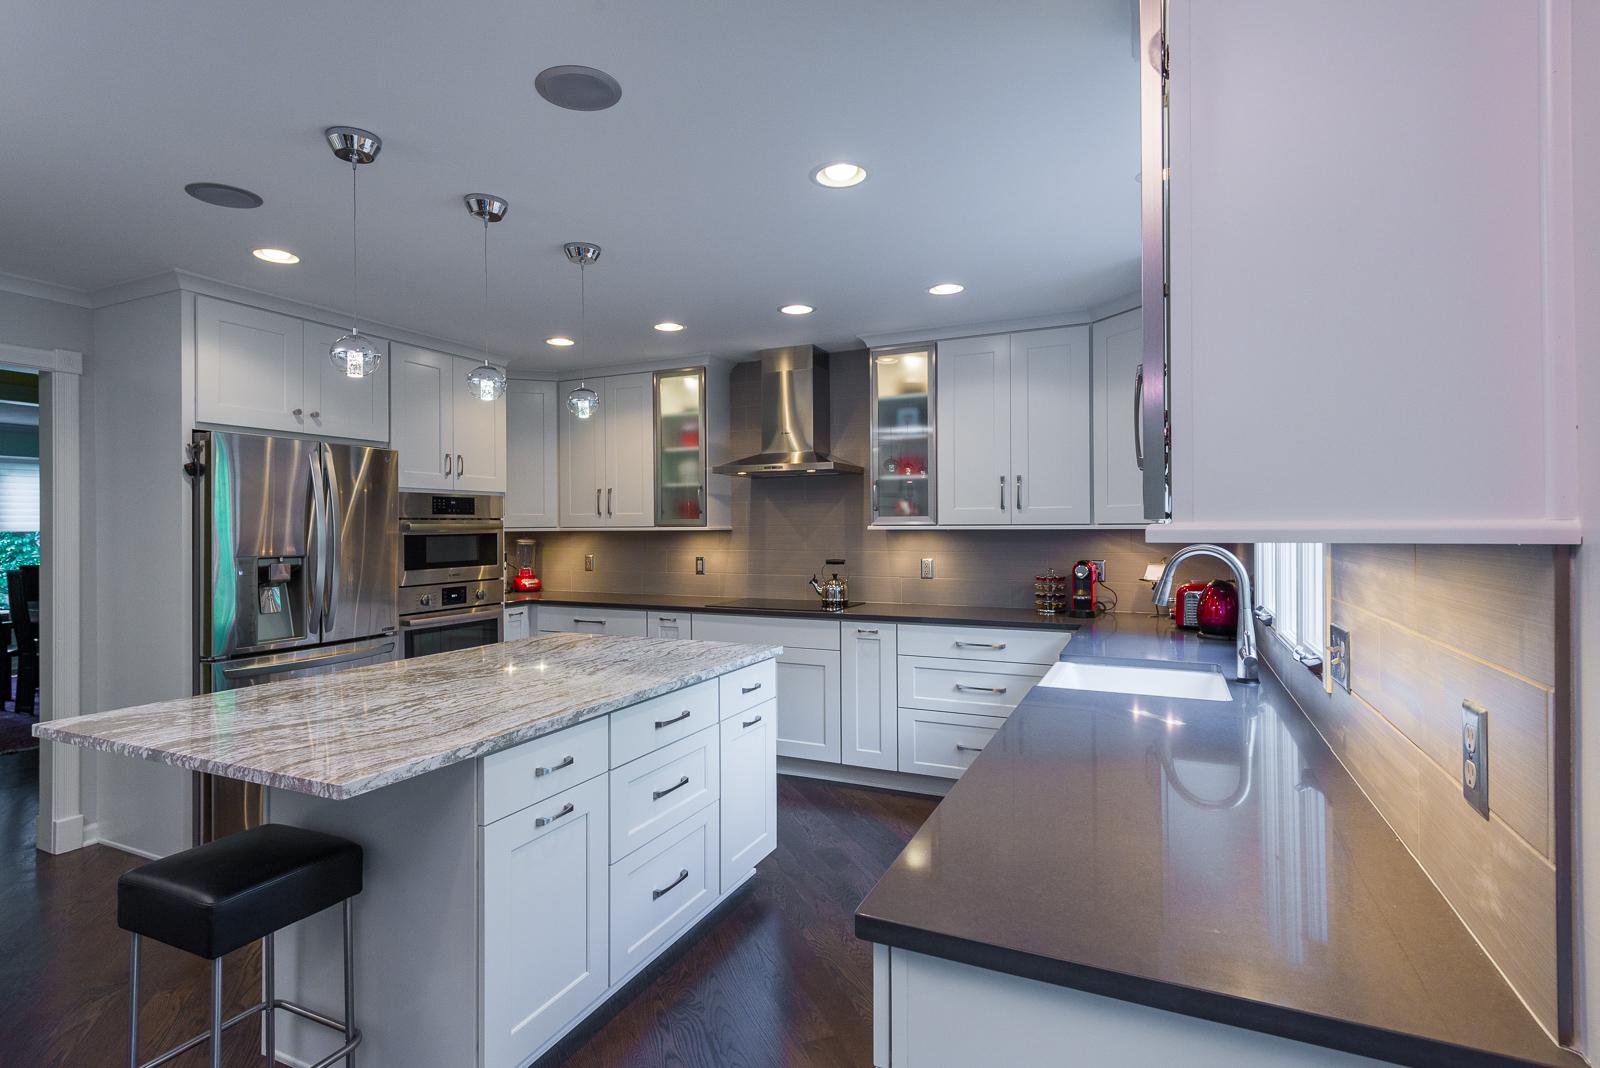 Kitchen and First Floor Updates Carmel 2016